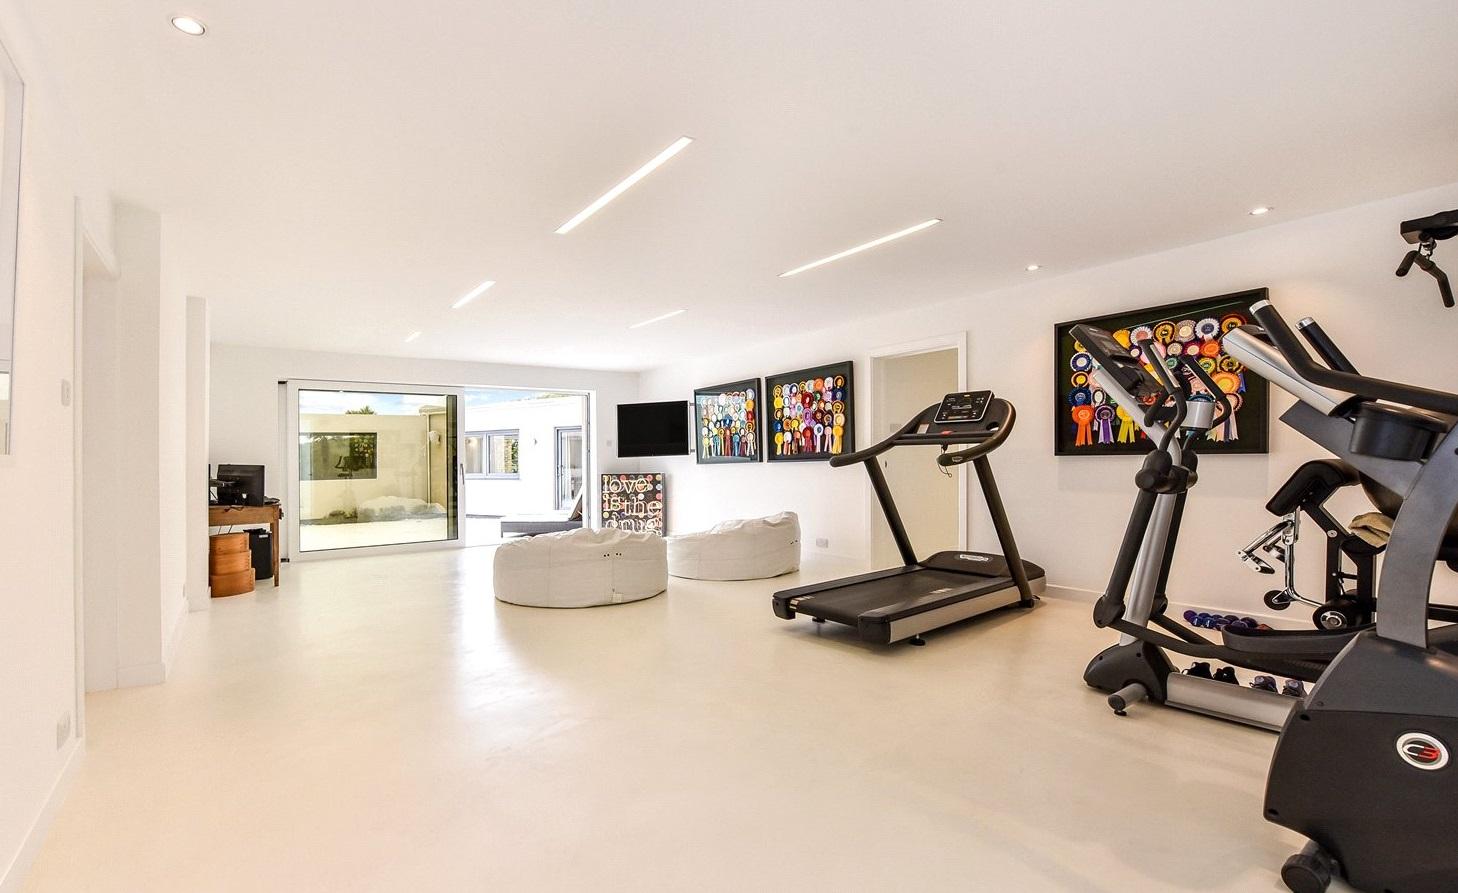 Rustington, West Sussex, 4 Bedrooms, Home Gym